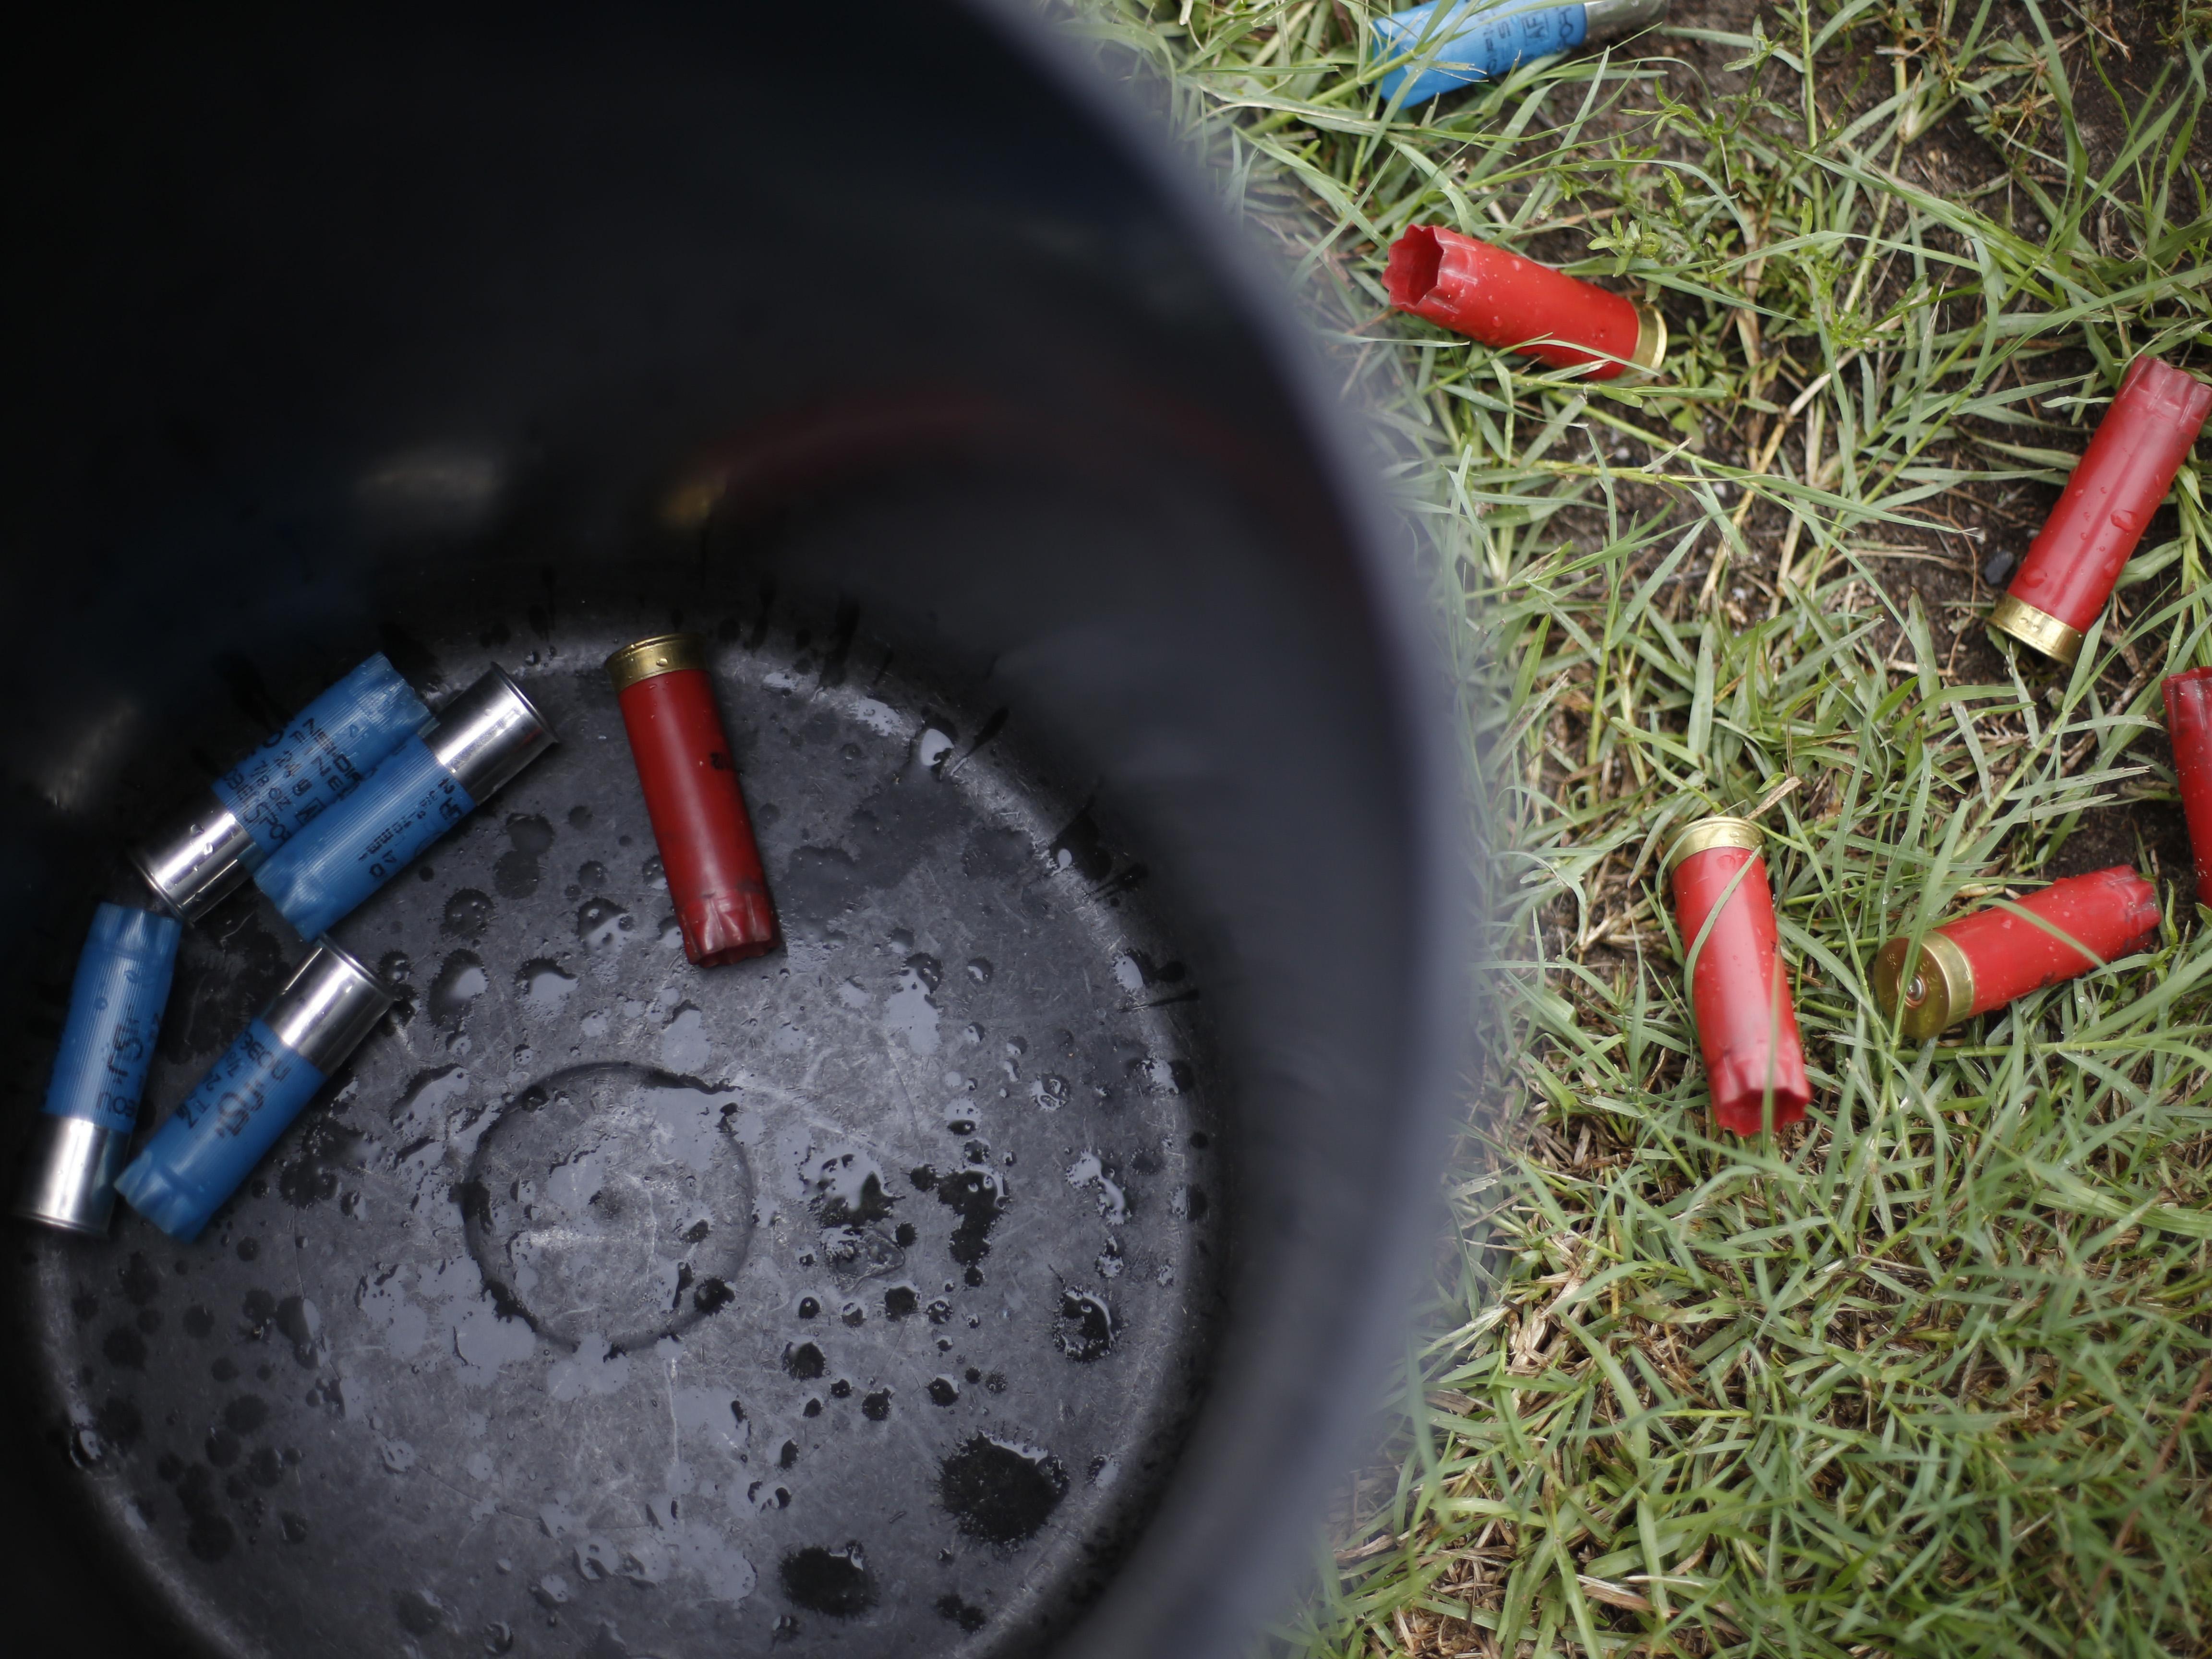 Empty shotgun shells litter the ground at Bridge Creek Clays South Georgia Youth Shooting Club's clay pigeon range on Tuesday, June 30, 2015.